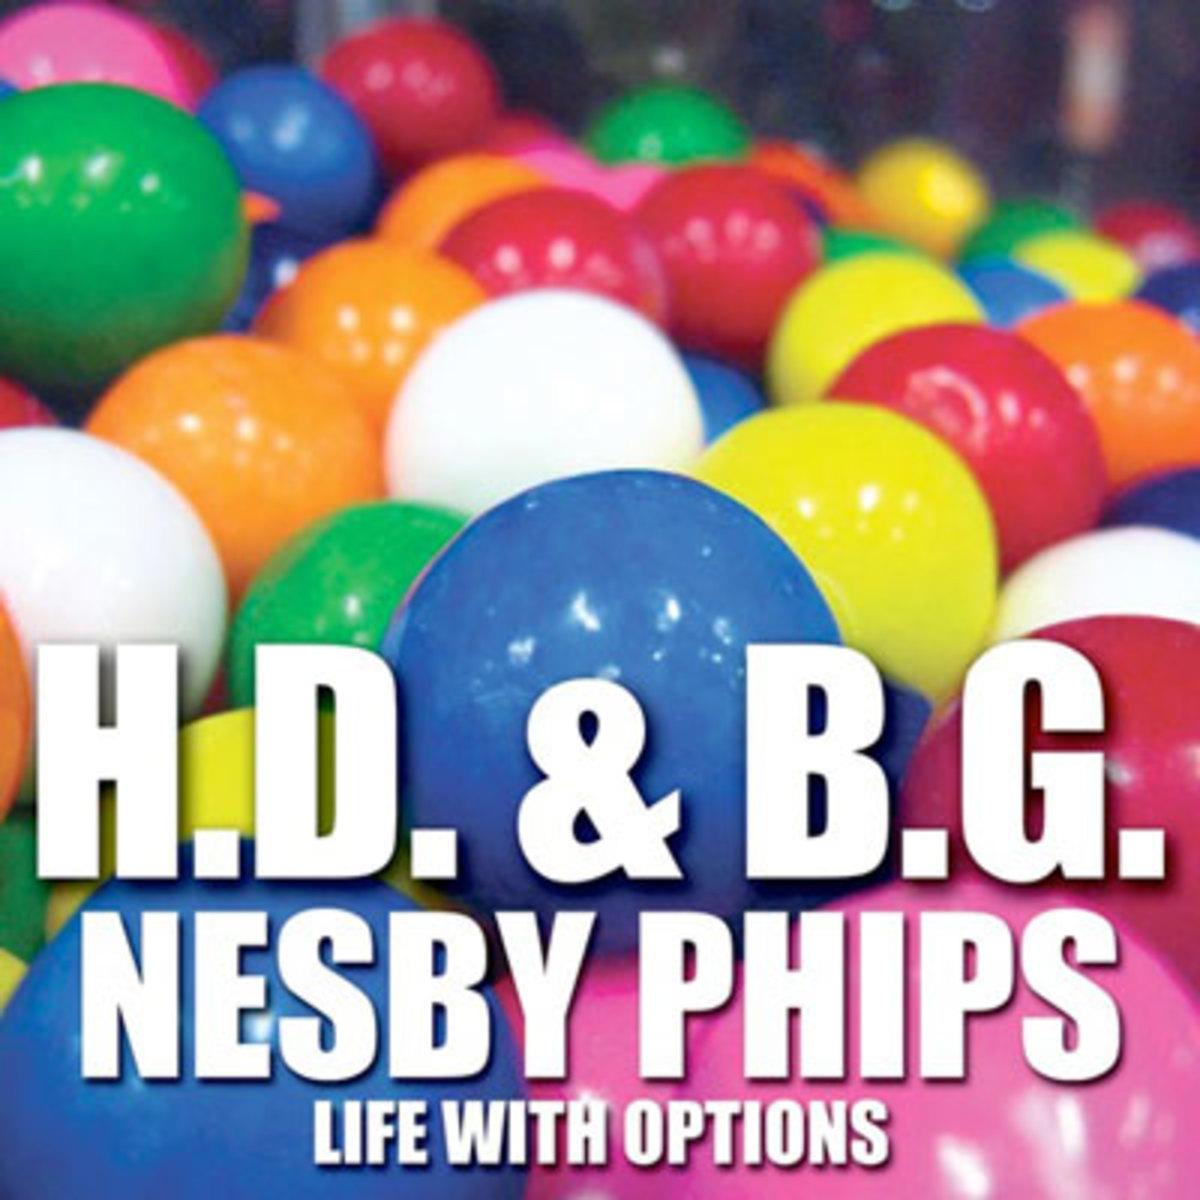 nesbyphips-hdbg.jpg